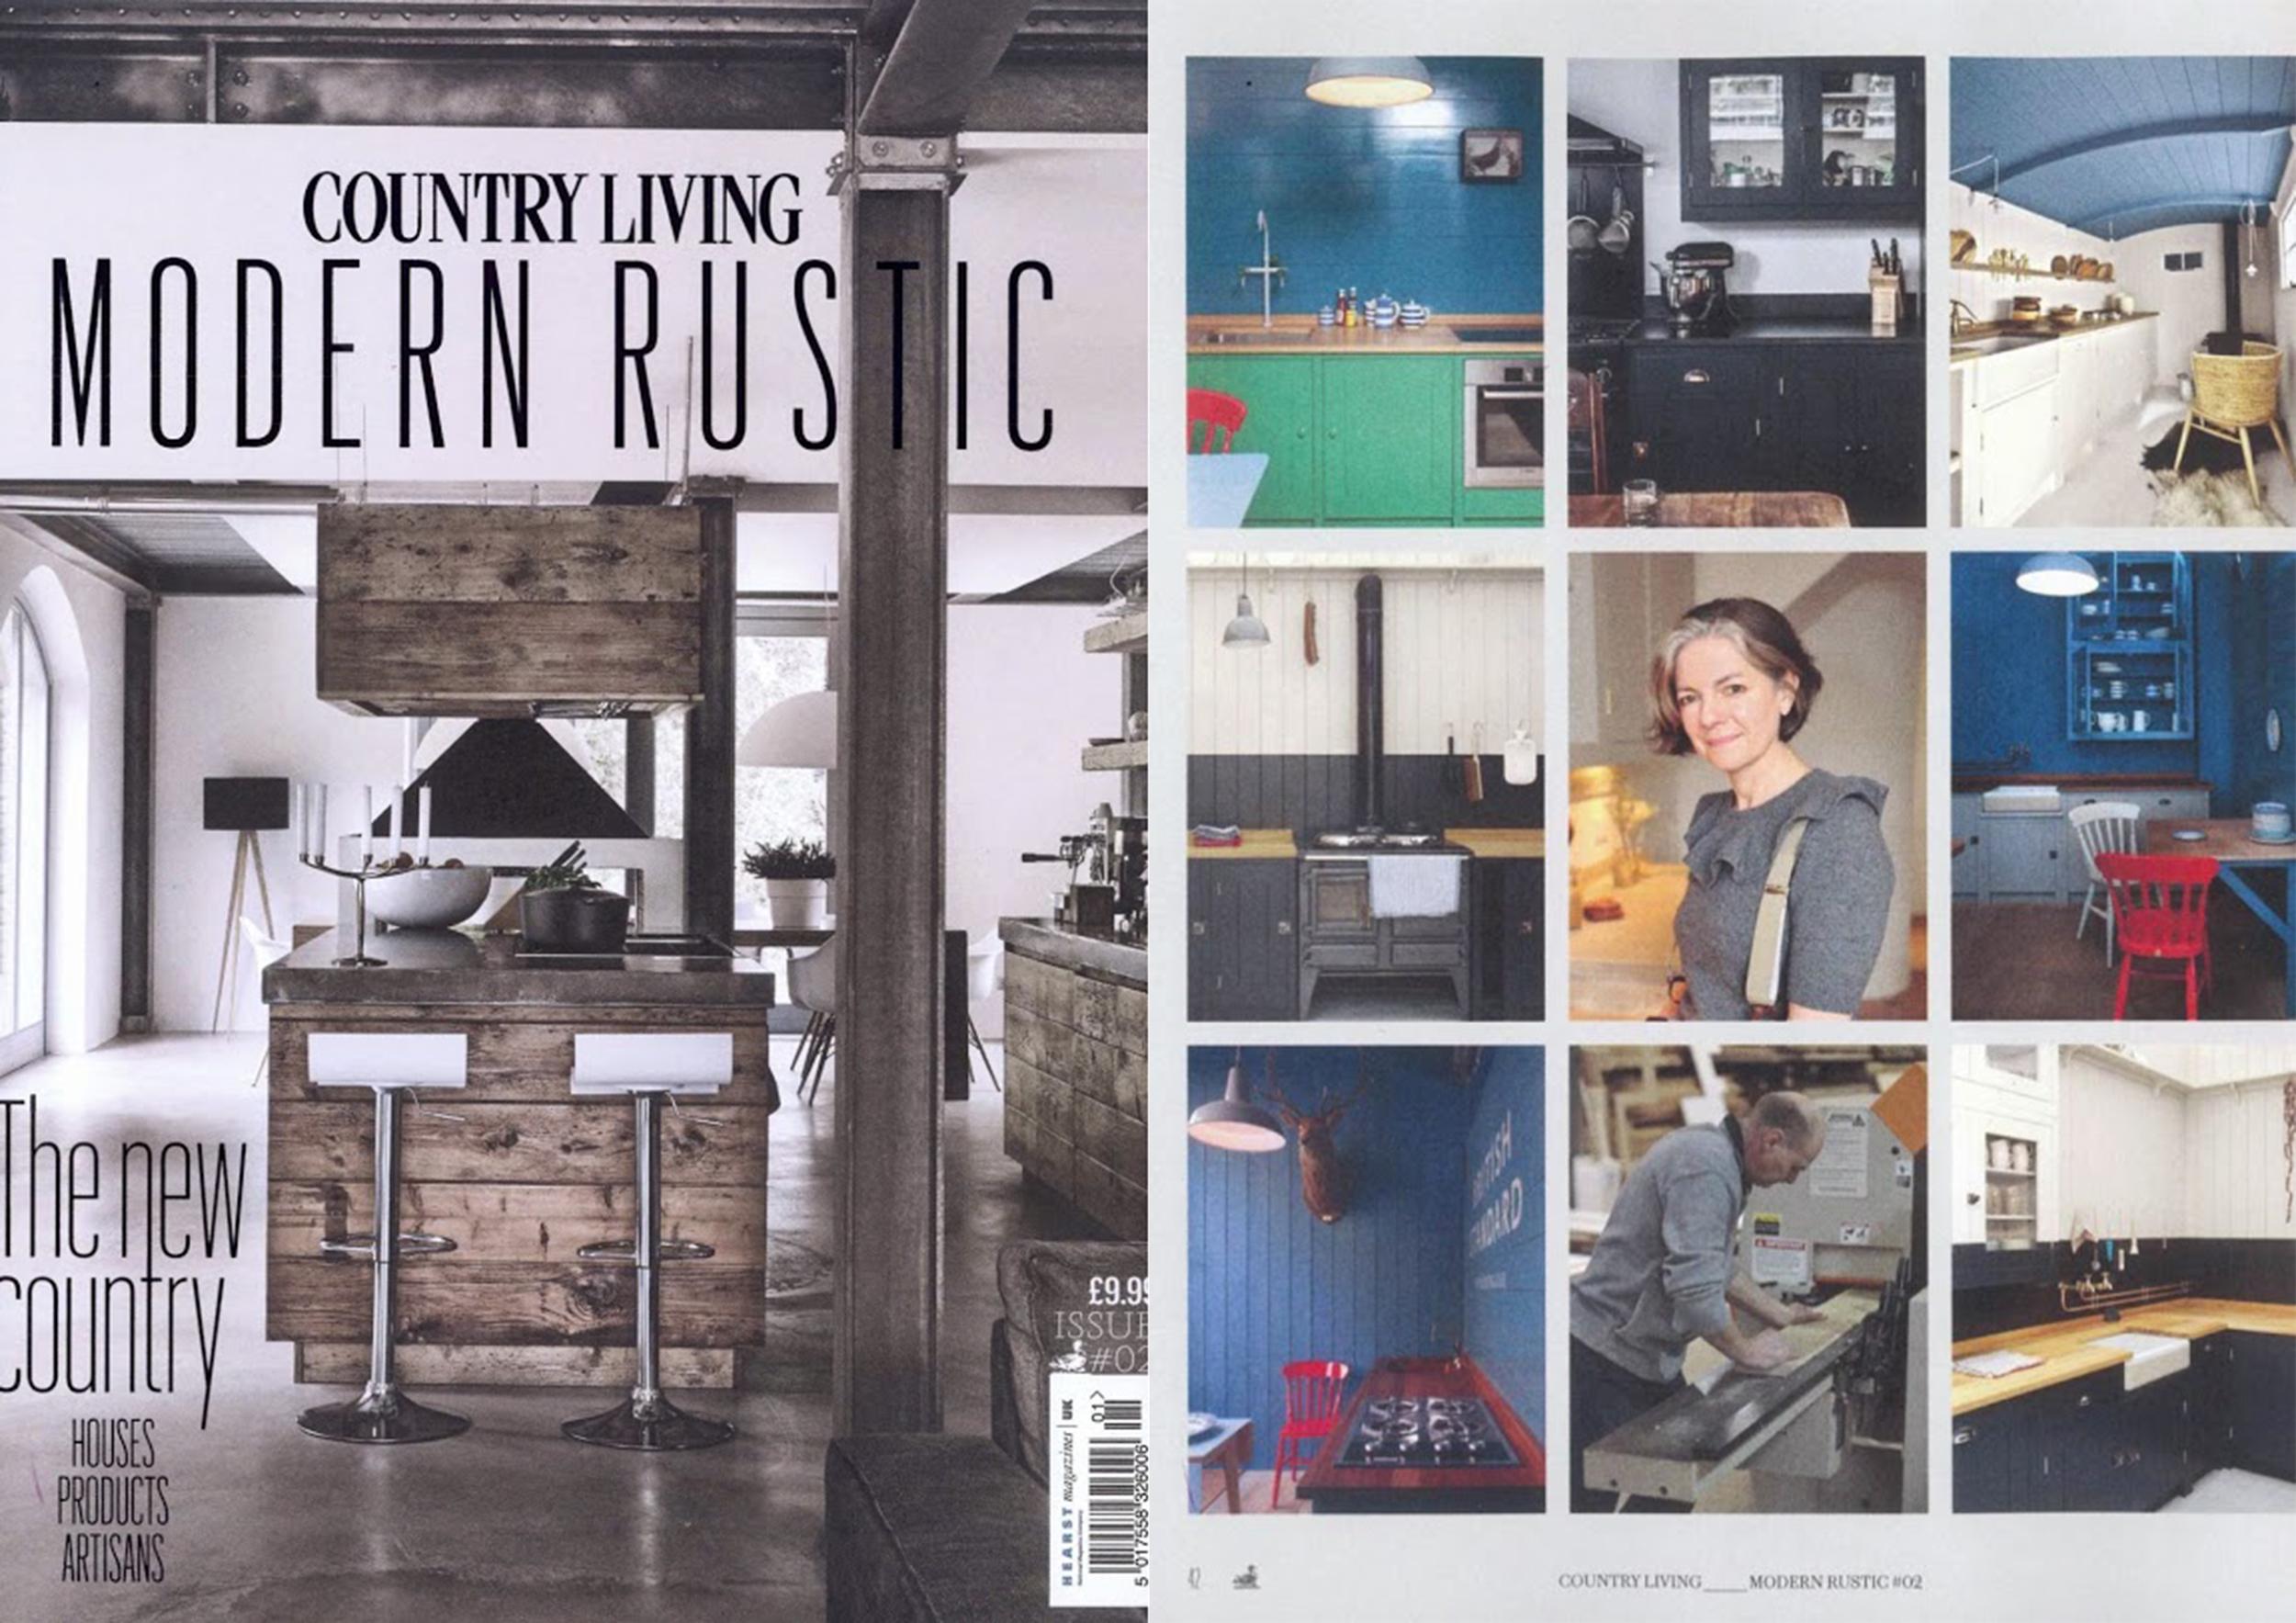 BS_CountryLivingModernRustic_Cover.jpg